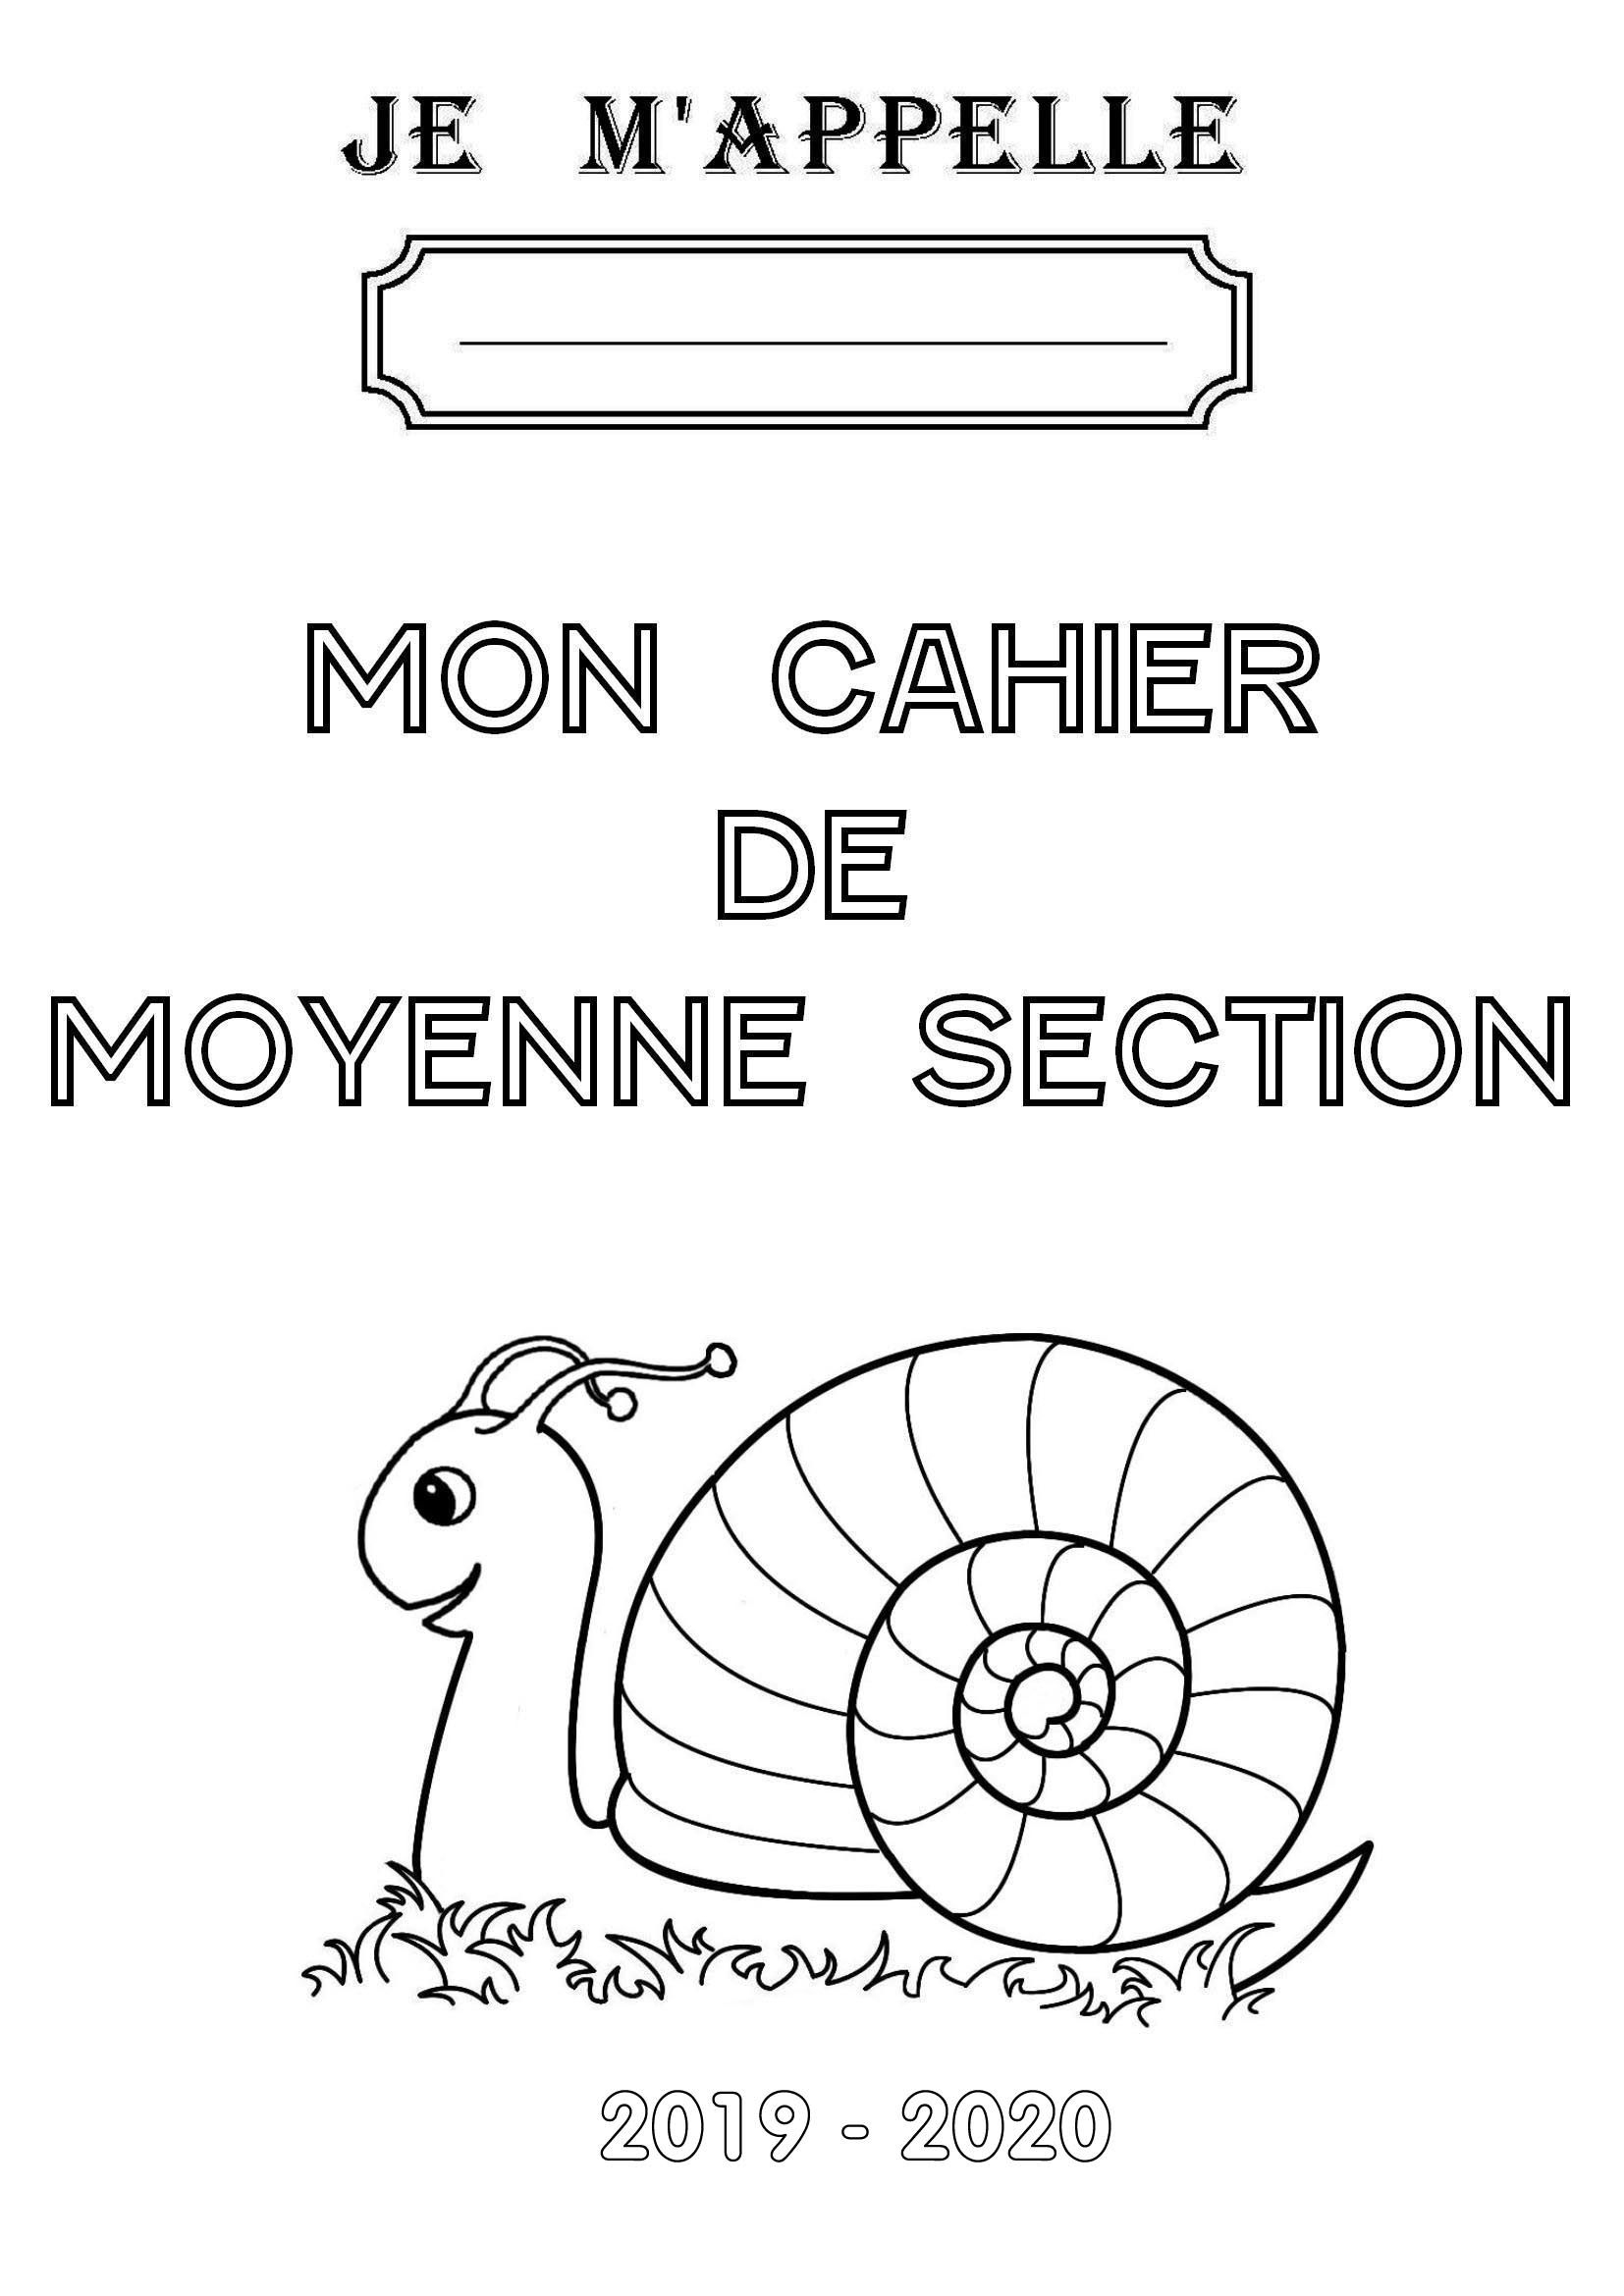 Ecriture Maternelle Moyenne Section A Imprimer Hy06 destiné Exercices Moyenne Section Maternelle À Imprimer